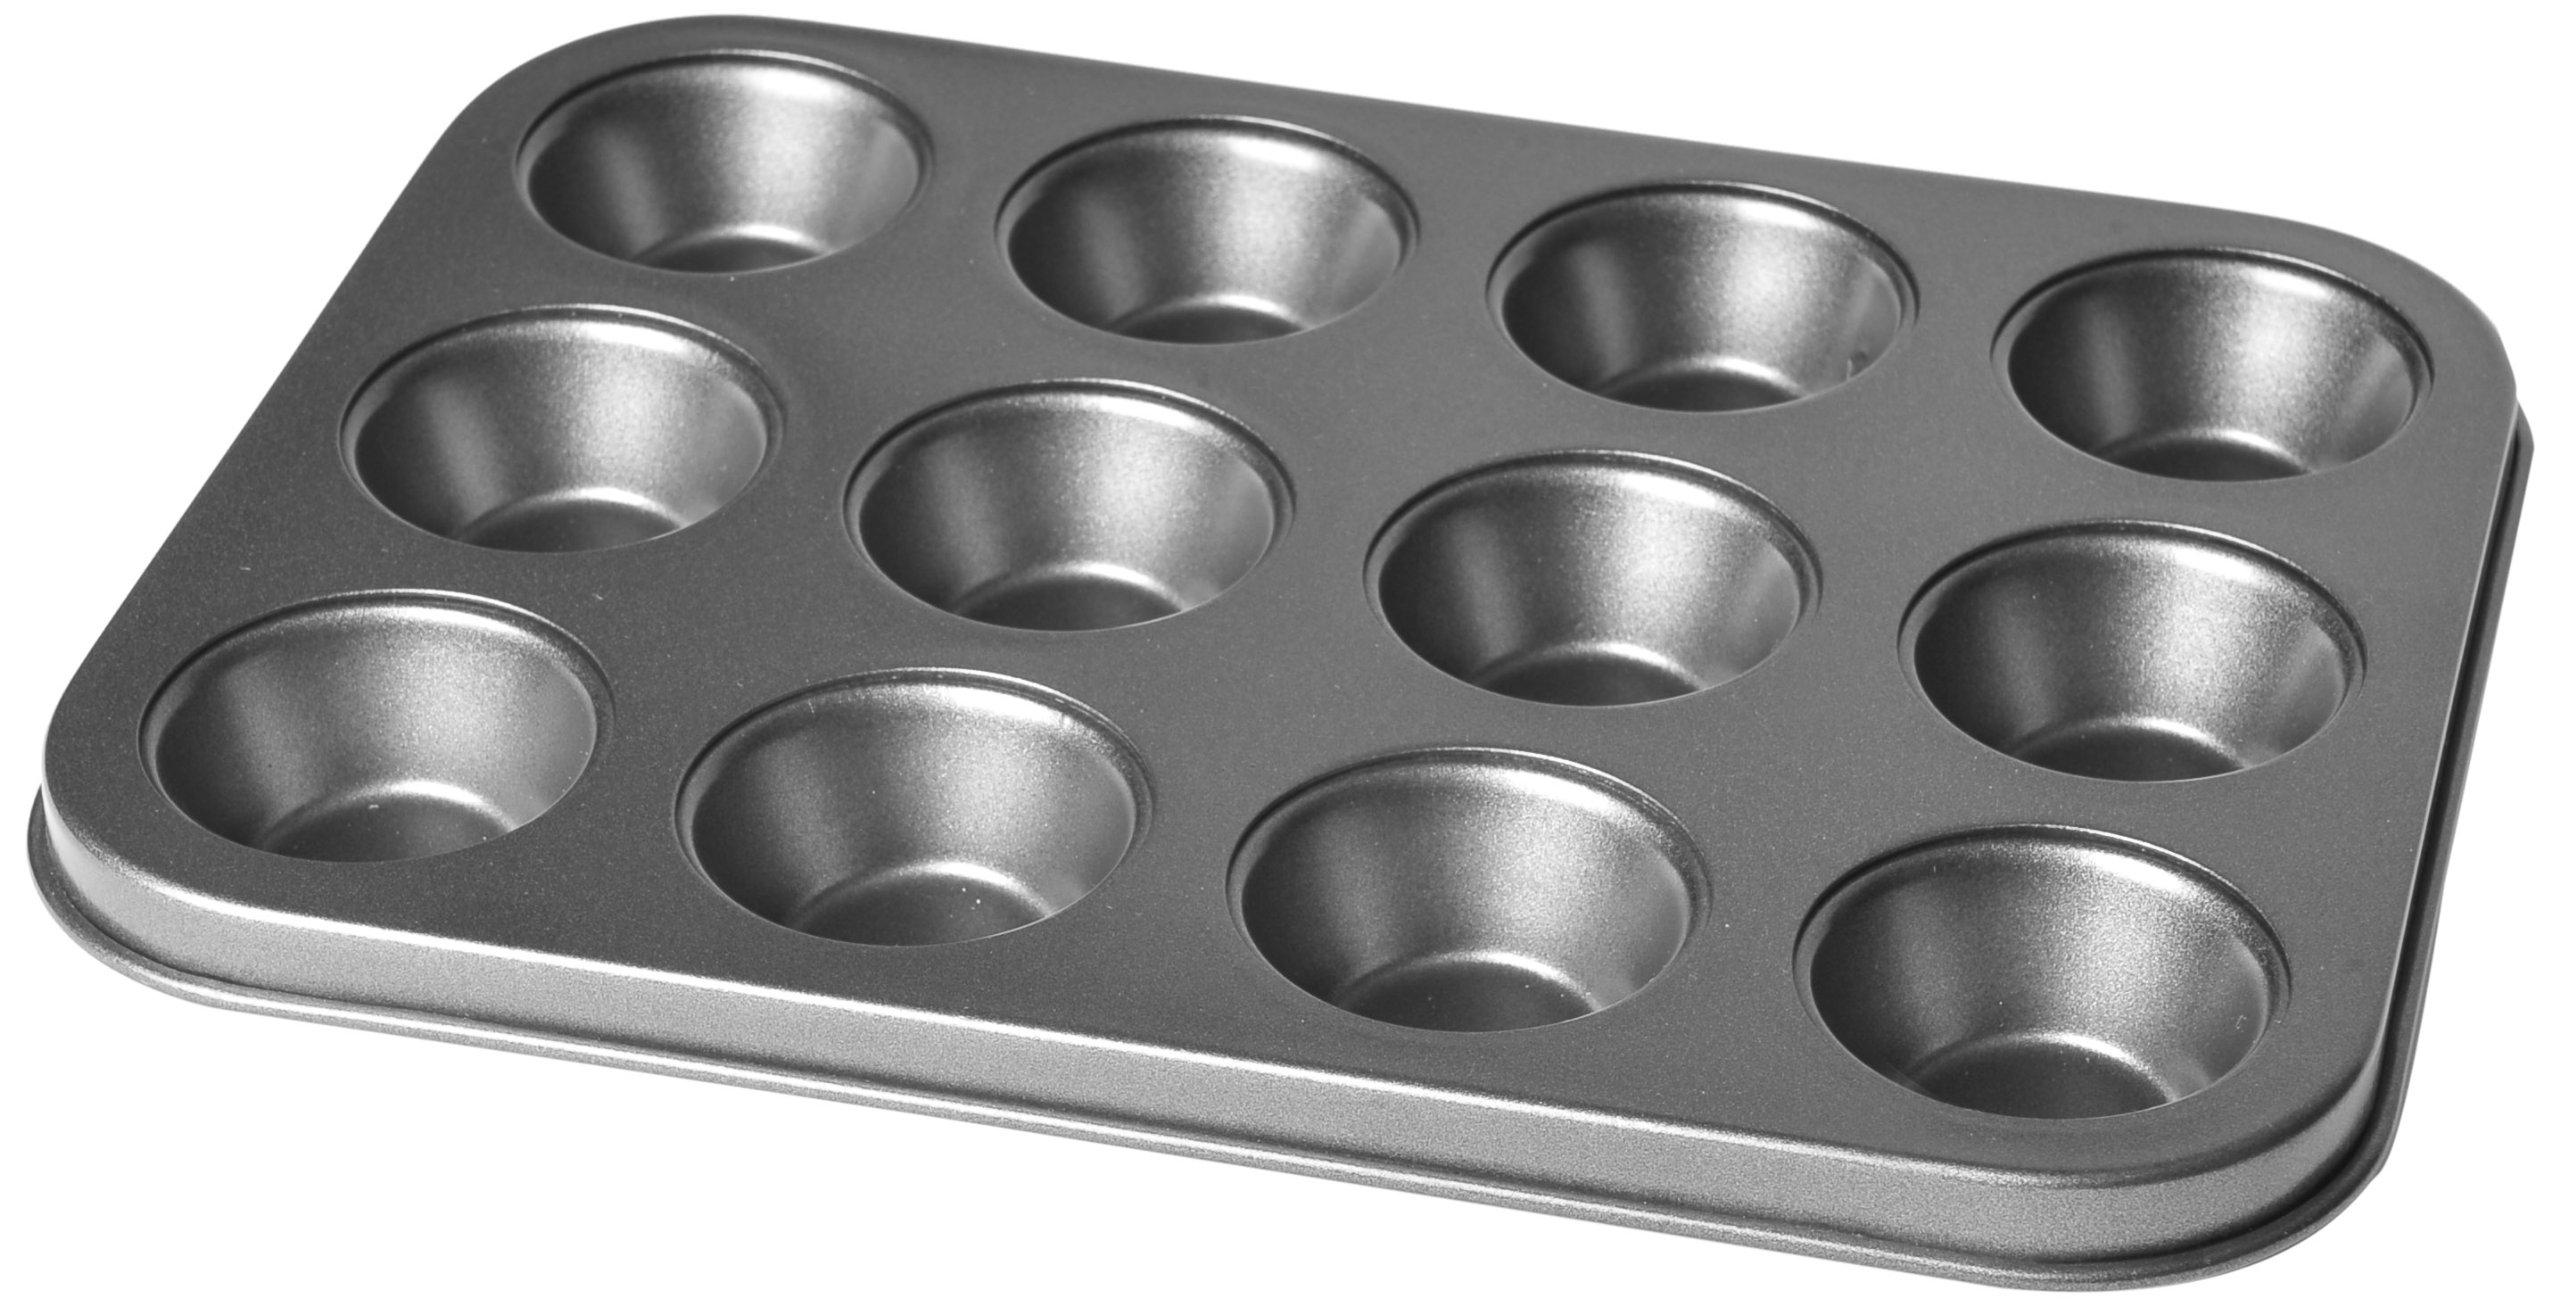 Chloe's Kitchen 201-103 Muffin Mini 12-Cavity Pan, Non-Stick